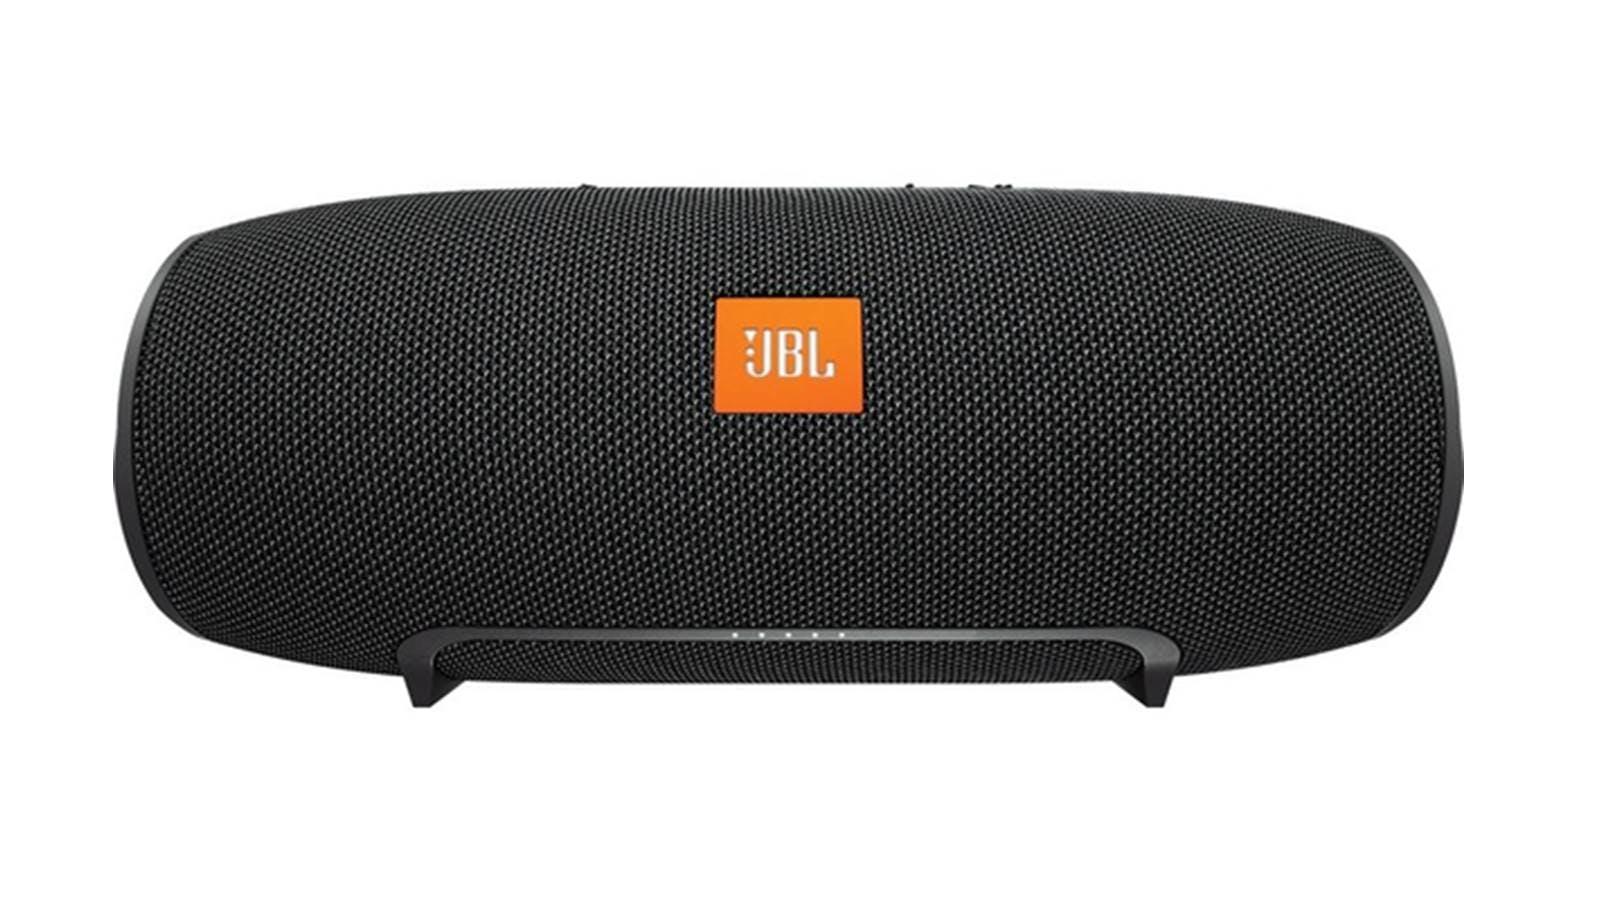 Home :: Headphones, Audio & Music :: Sound Systems :: Portable Speakers ::  JBL Xtreme Portable Bluetooth Speaker - Black